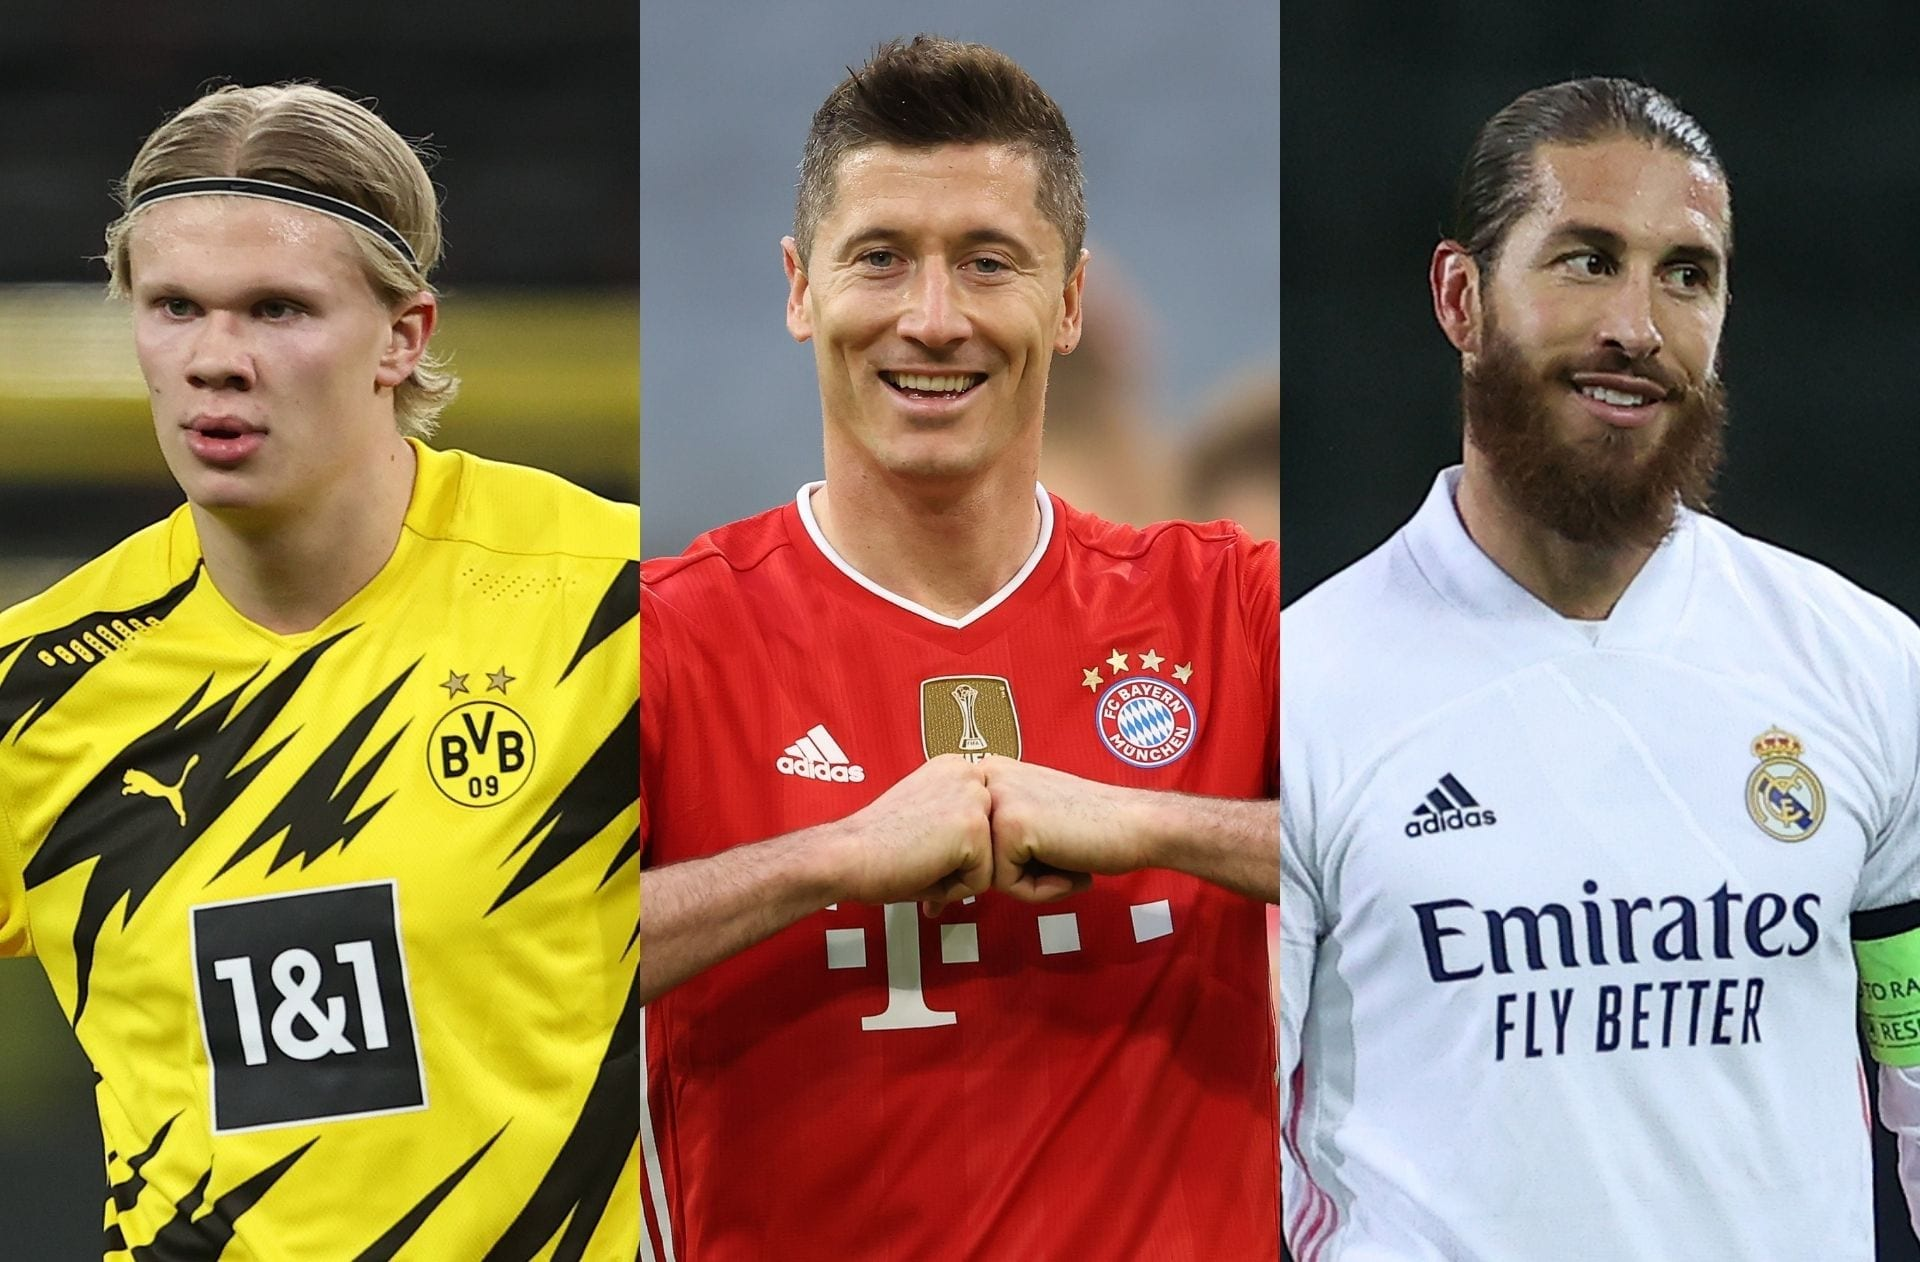 Saturday's transfer rumors - Chelsea join 5-way battle for Lewandowski